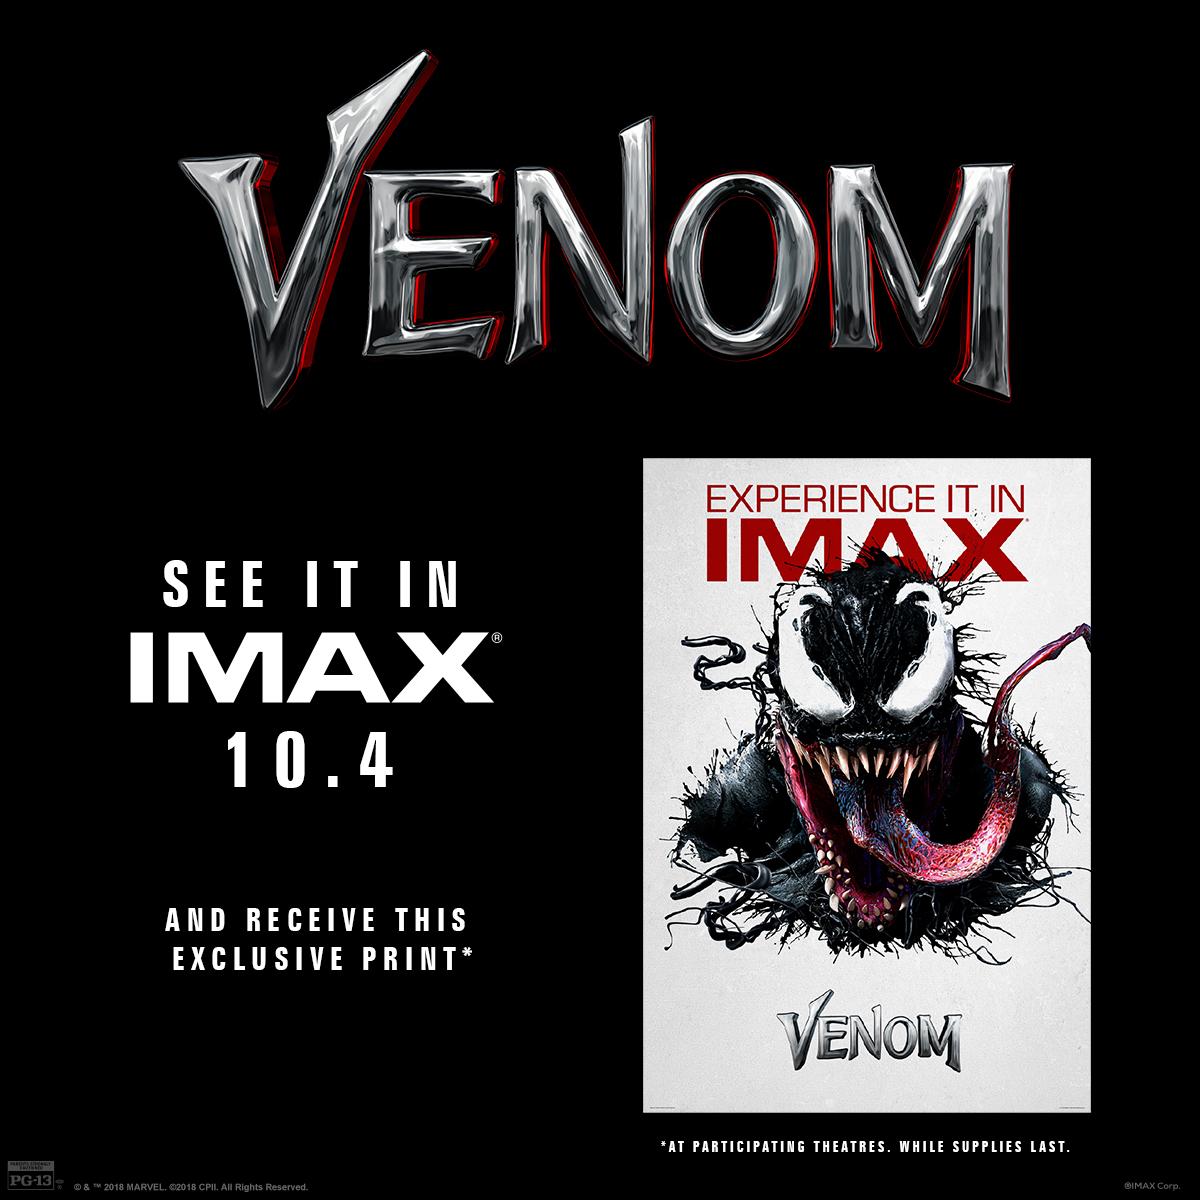 Venom IMAX Poster Giveaway